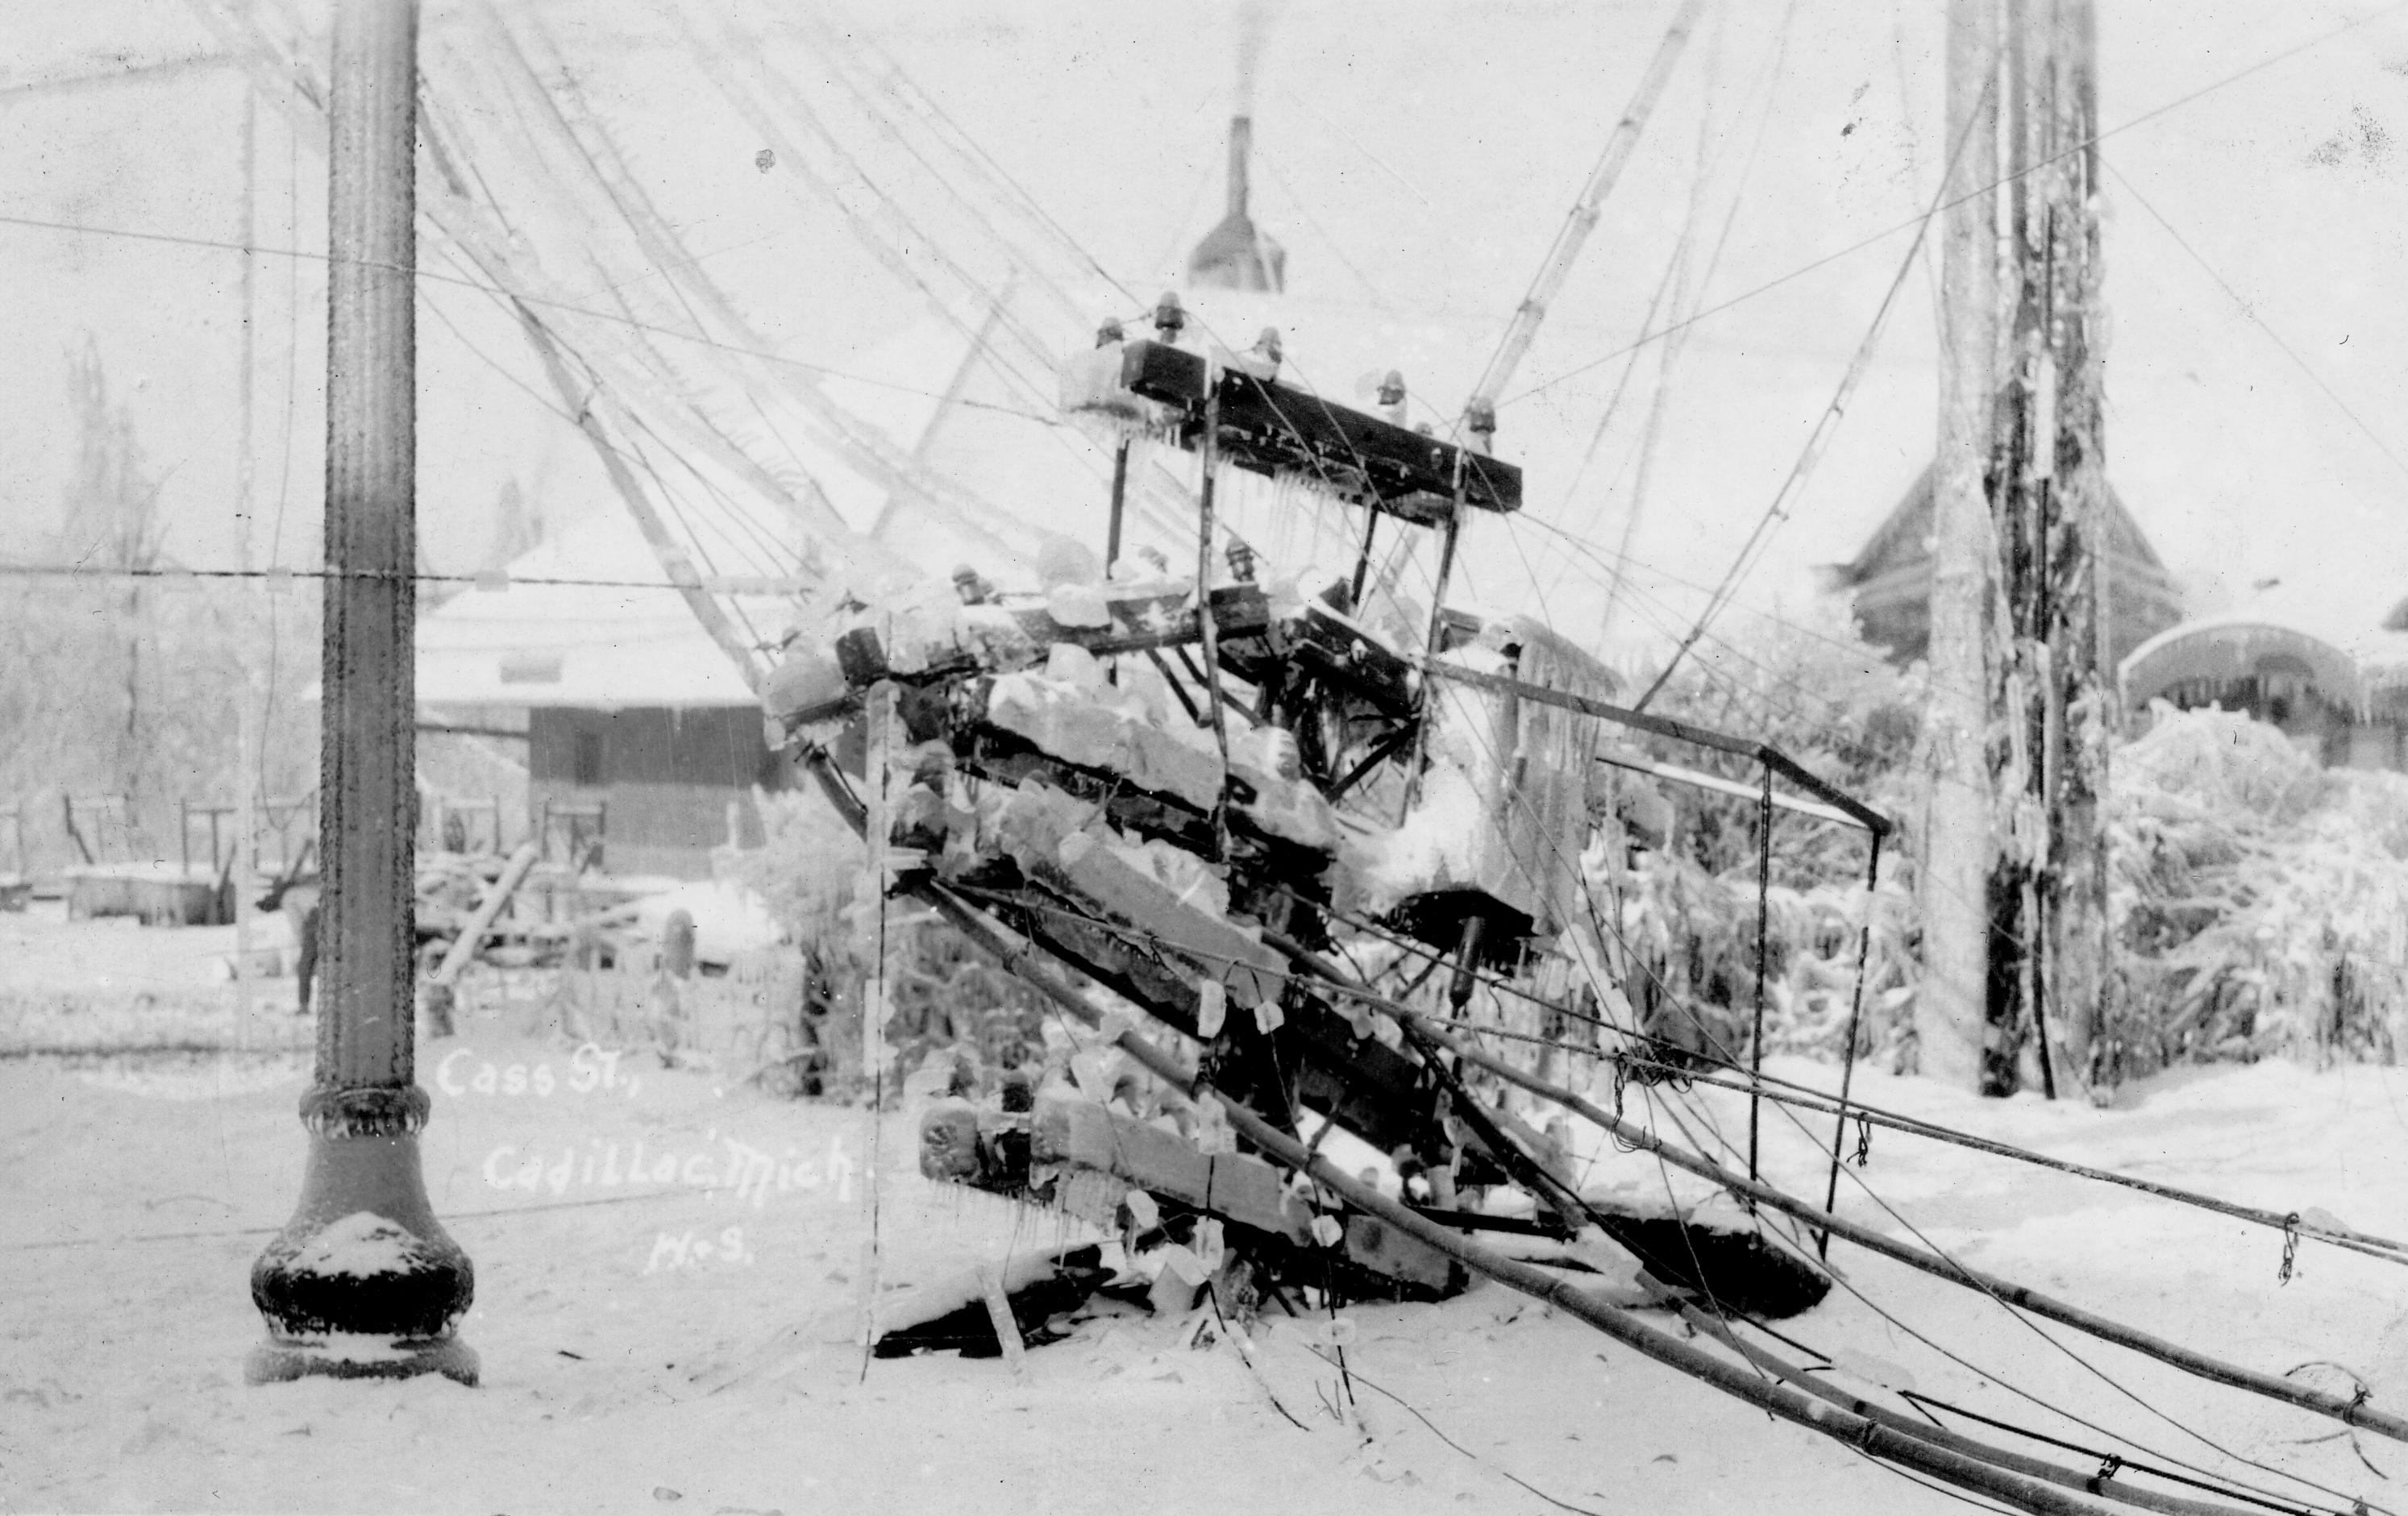 1922 Ice Storm - Cass Street Looking Toward Depot